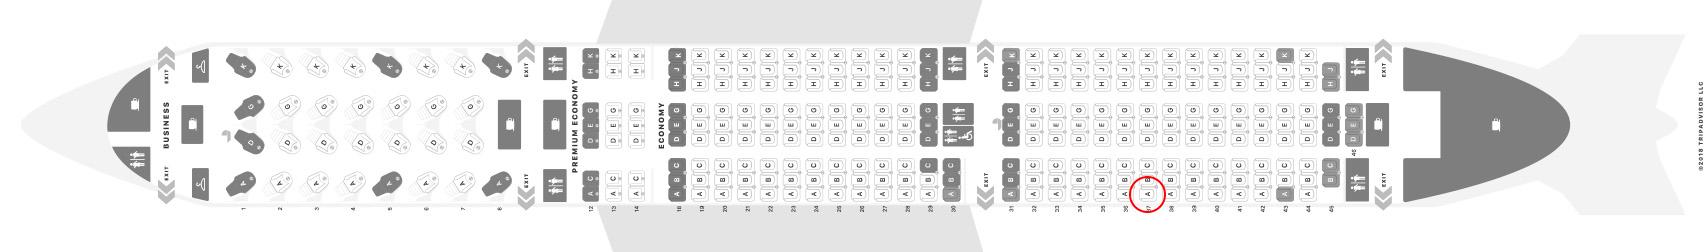 Air Canada 787-9 seat map